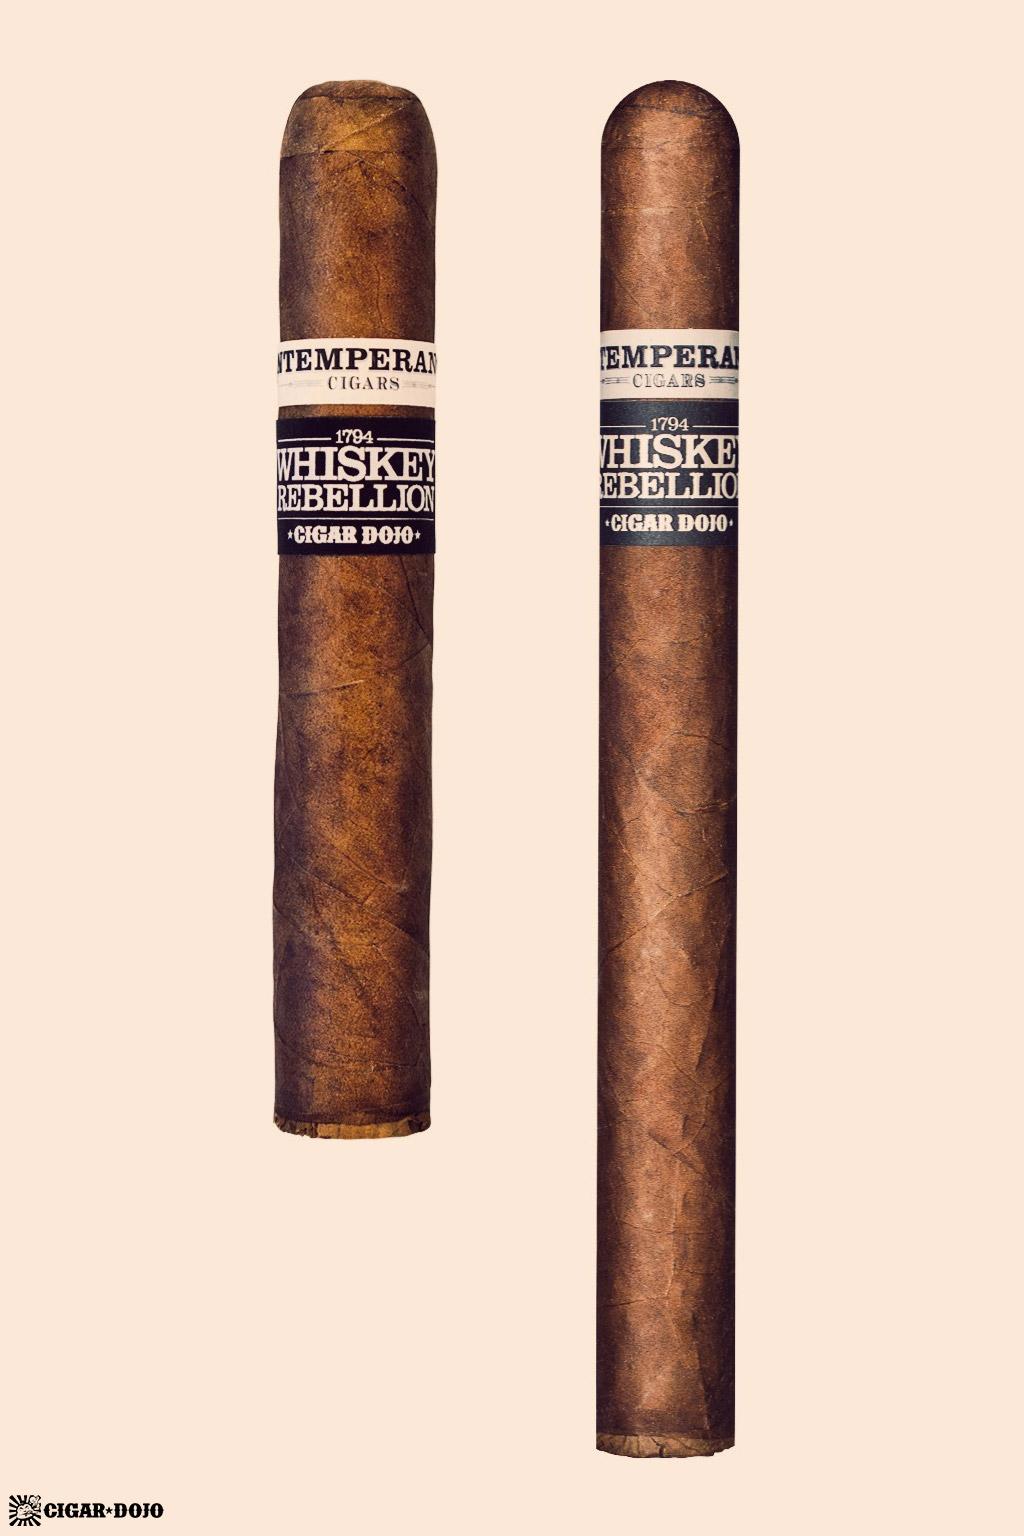 RoMa Craft Whiskey Rebellion 1794 cigar comparison